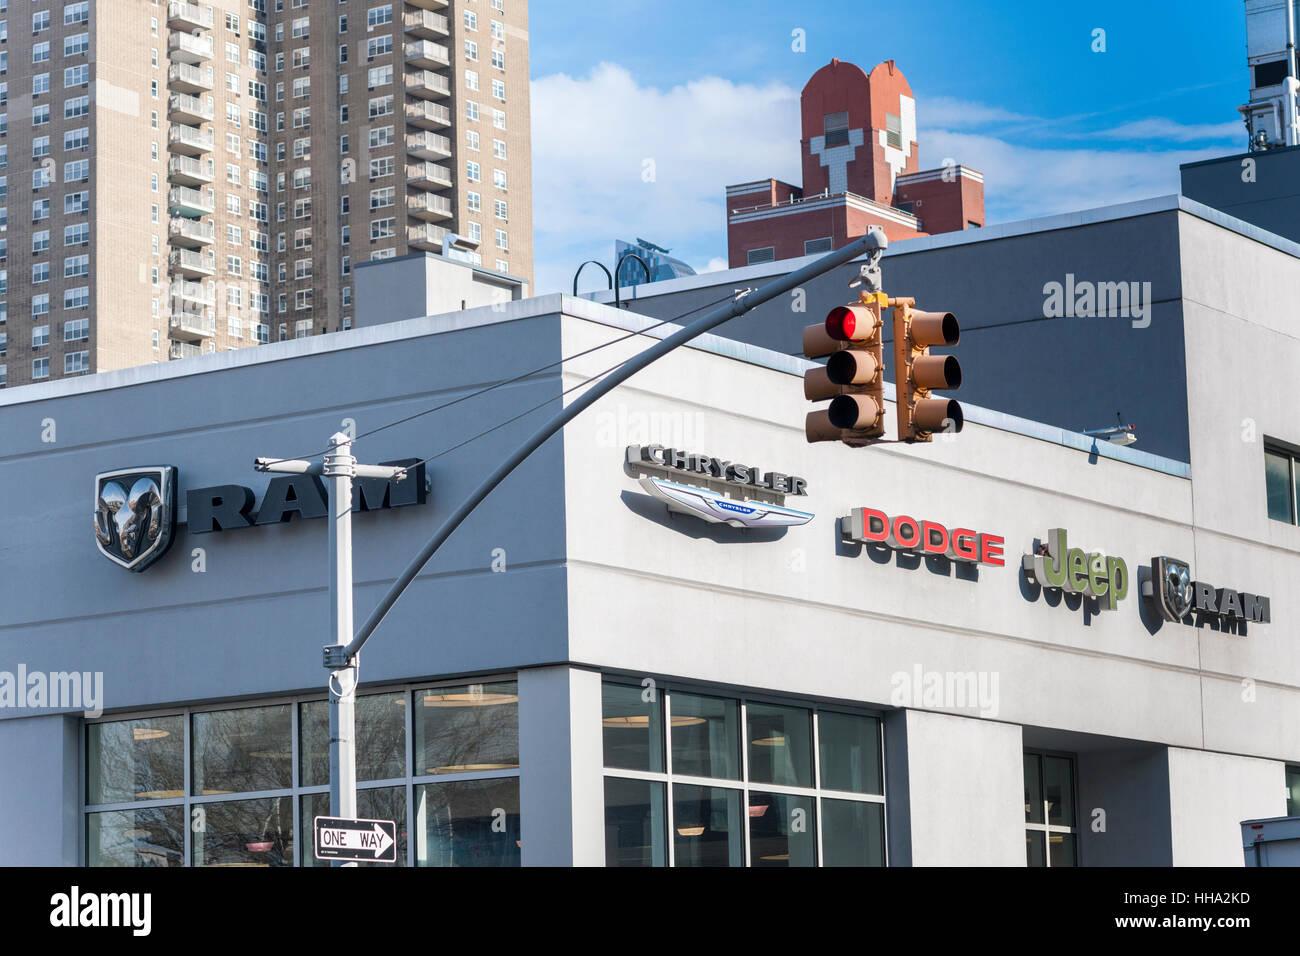 A Chrysler dealer in Manhattan in New York on Thursday, January 12, 2017. The U.S. Environmental Protection Agency Stock Photo